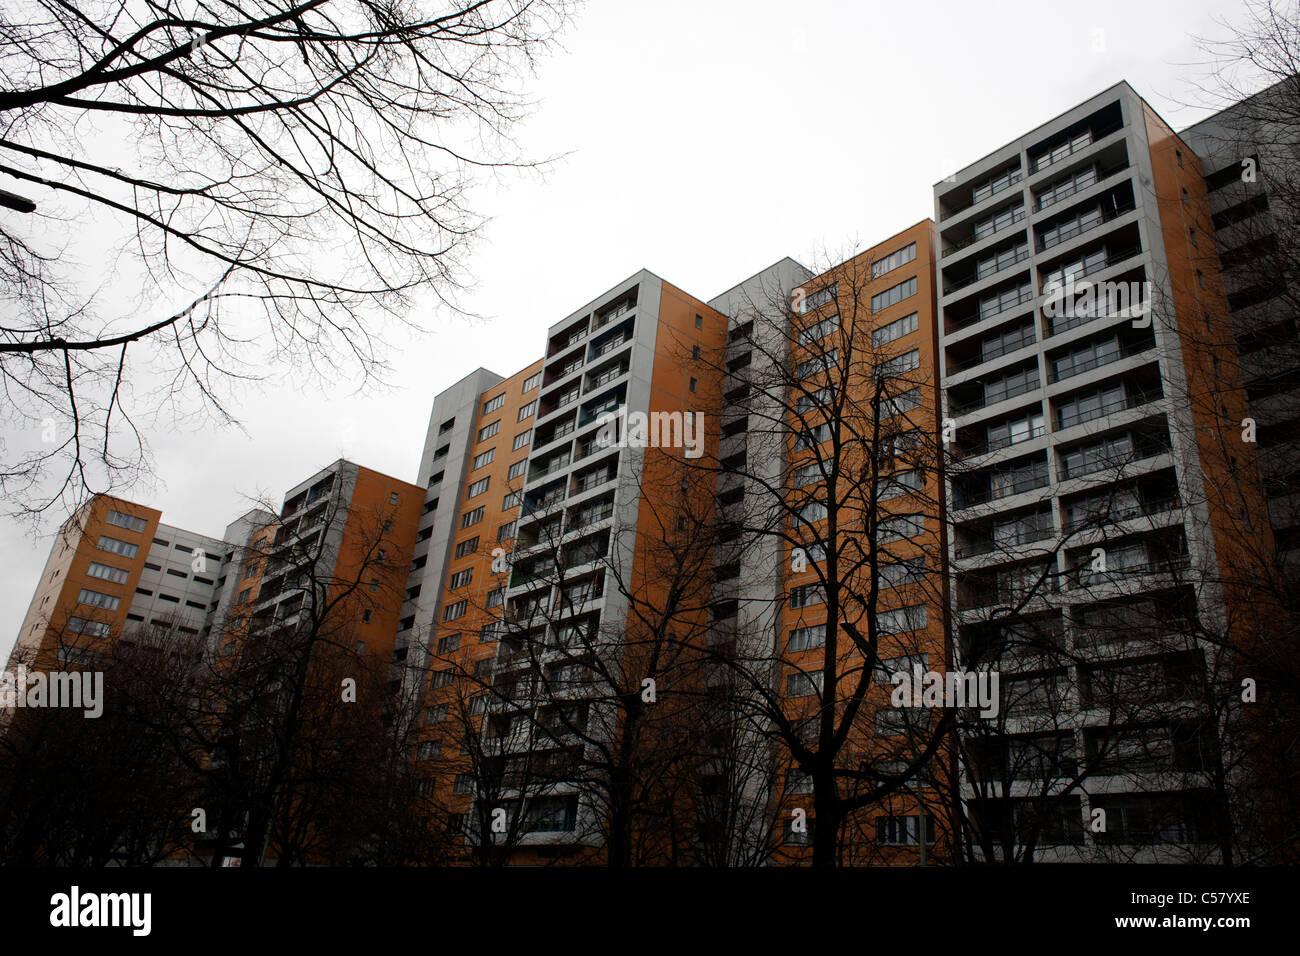 Social housing in Kreuzberg. Berlin, Germany. - Stock Image